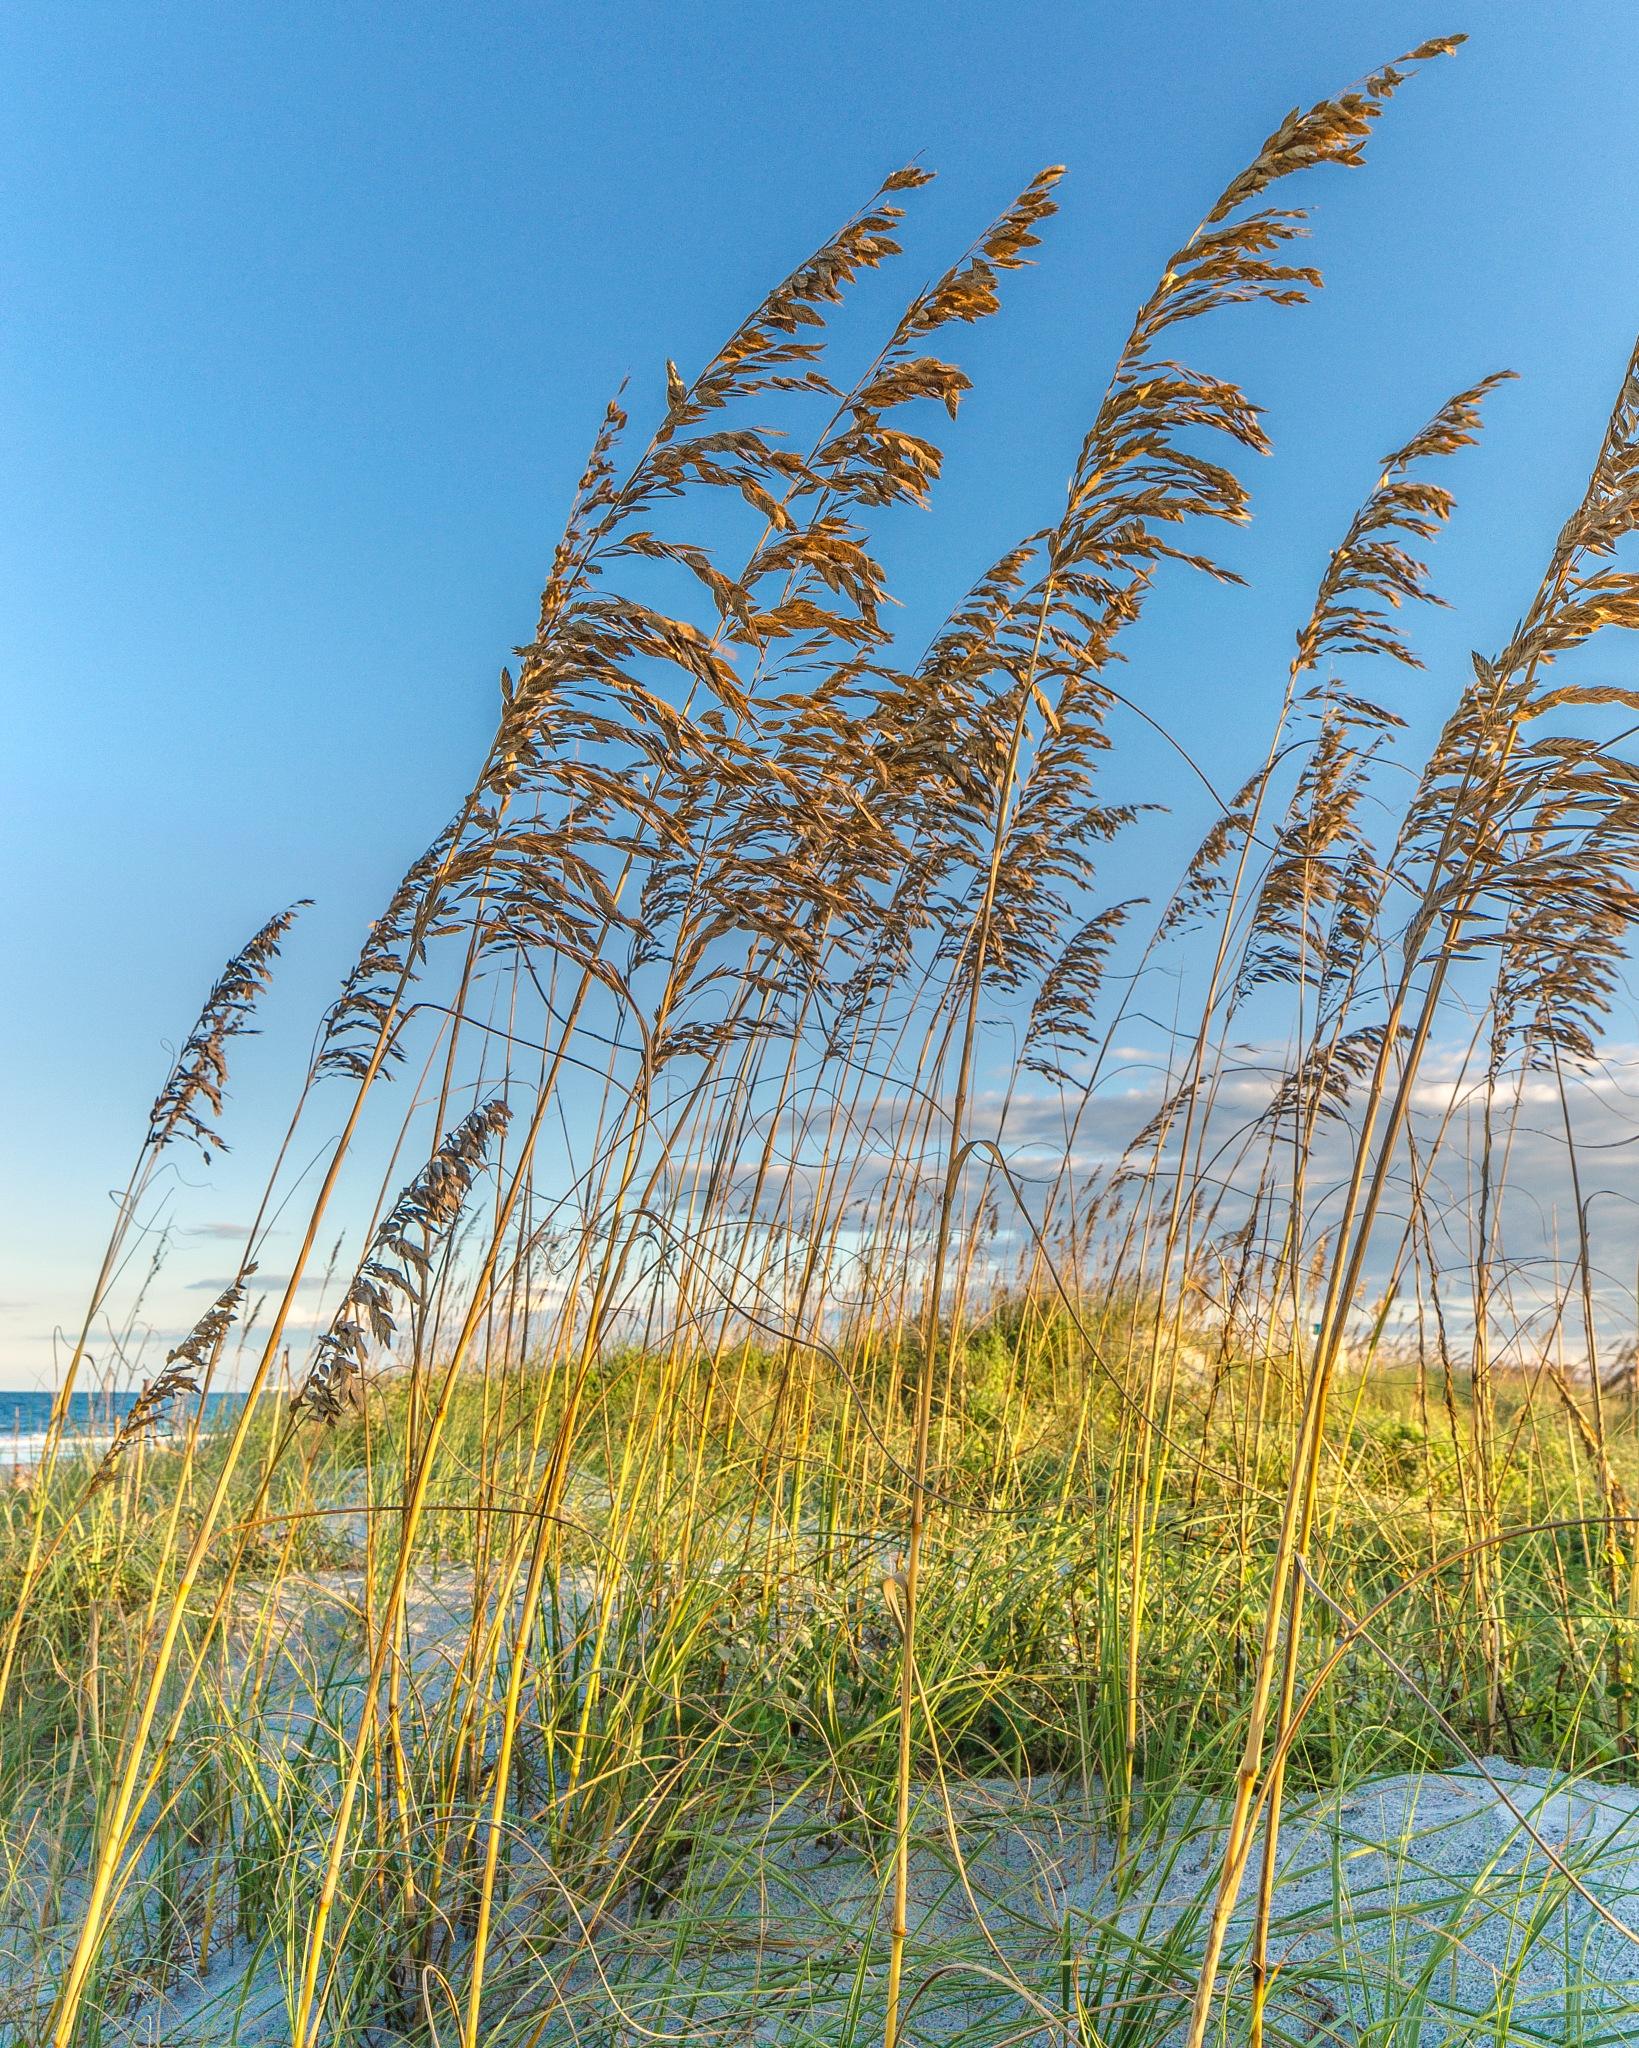 Fall in Florida by Steve Ducharme